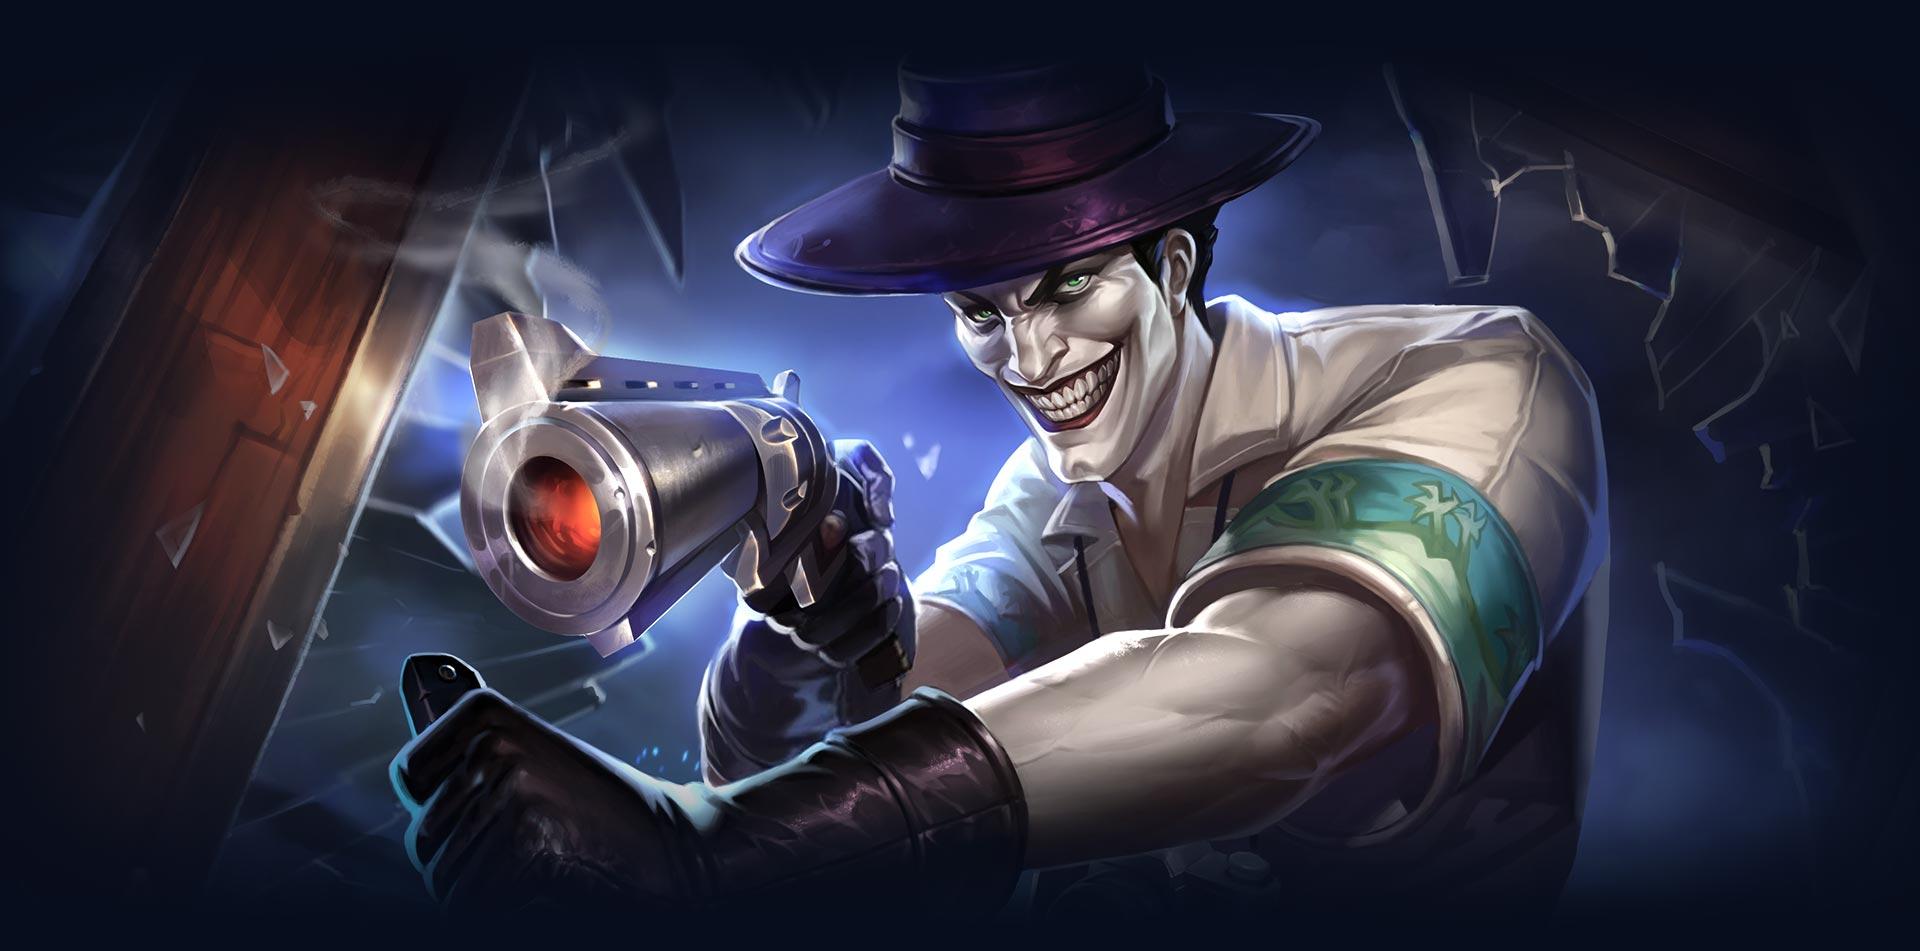 Hình nền Joker Liên Quân